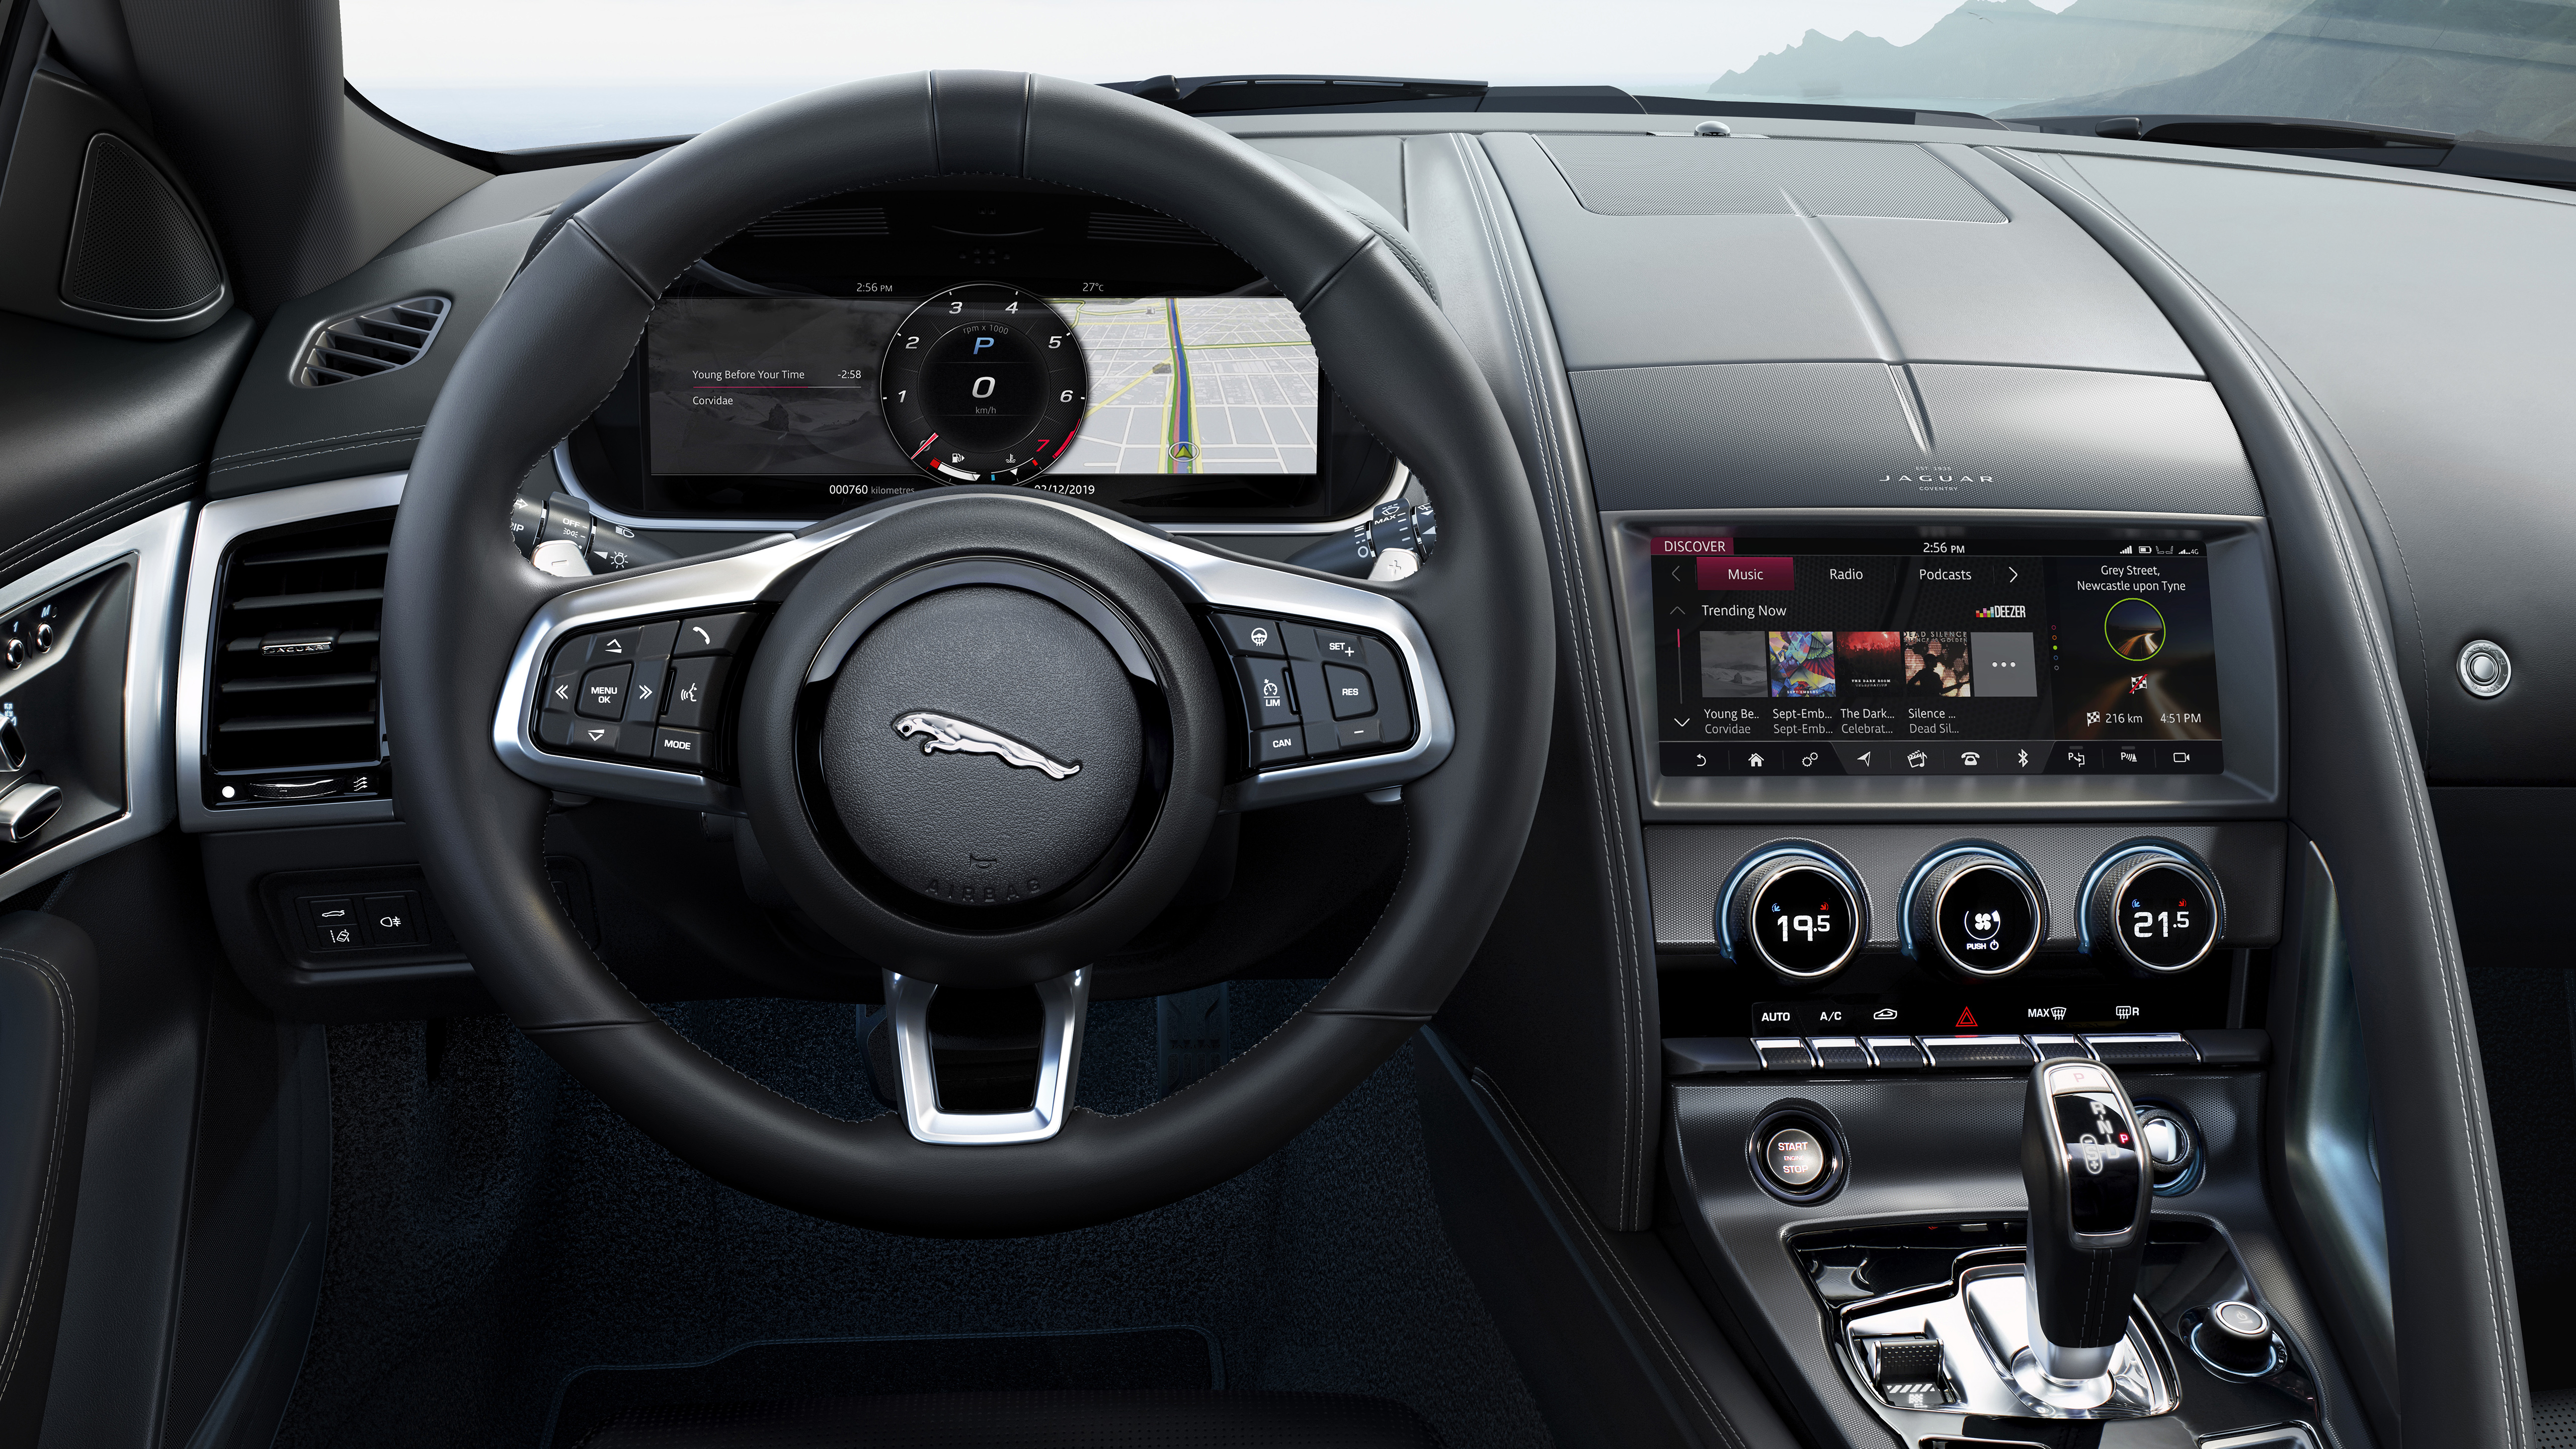 Jaguar F Type R Coupe 2020 4k Interior Wallpaper Hd Car Wallpapers Id 13913